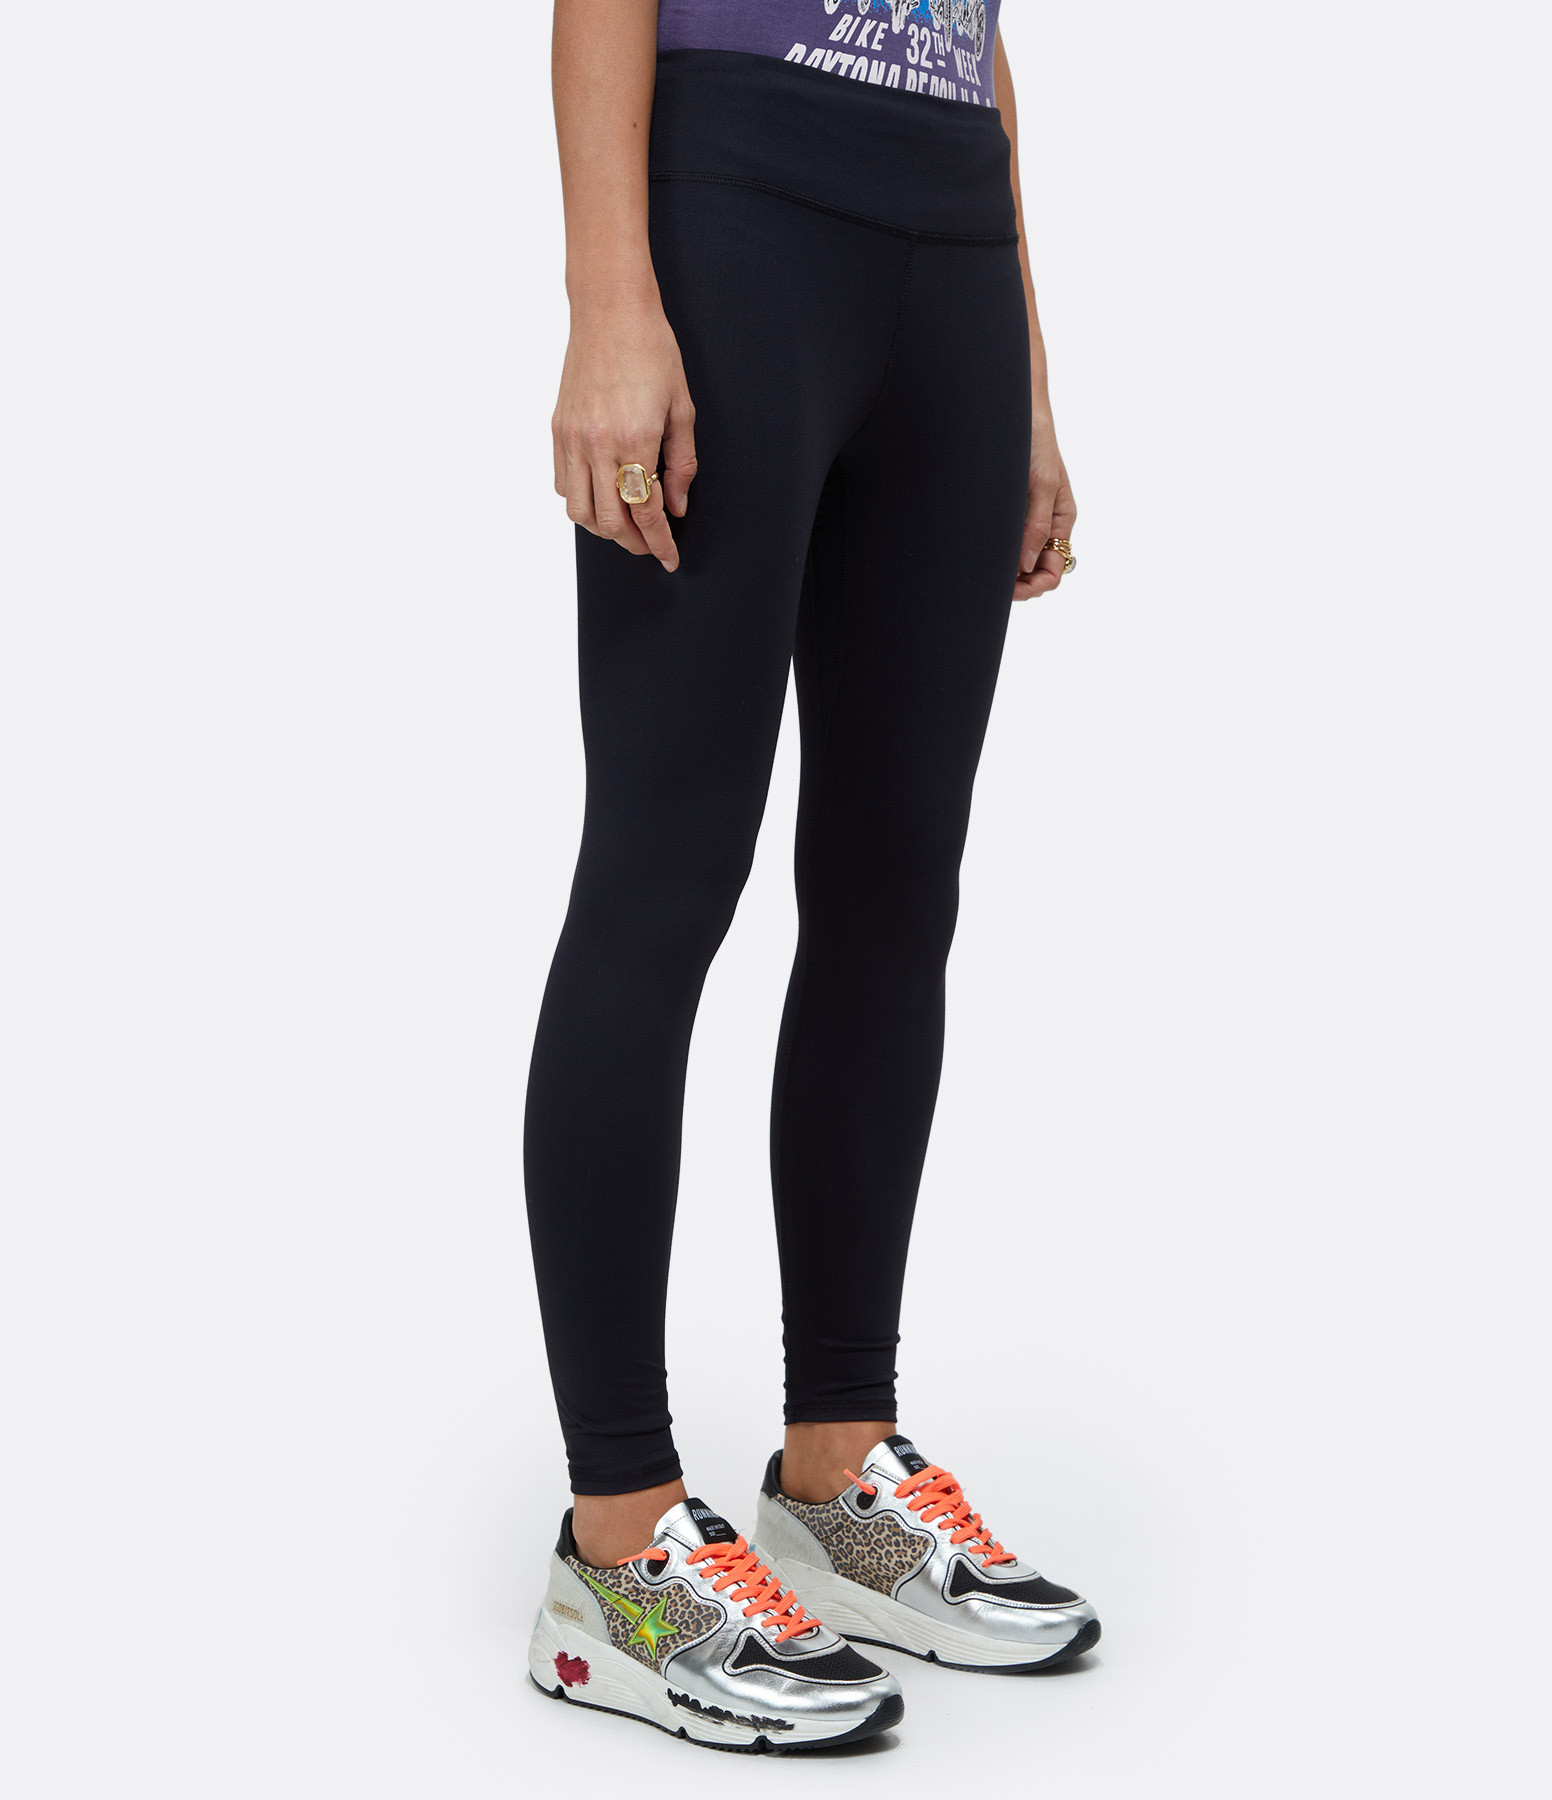 RAIINE - Legging Wynne Noir